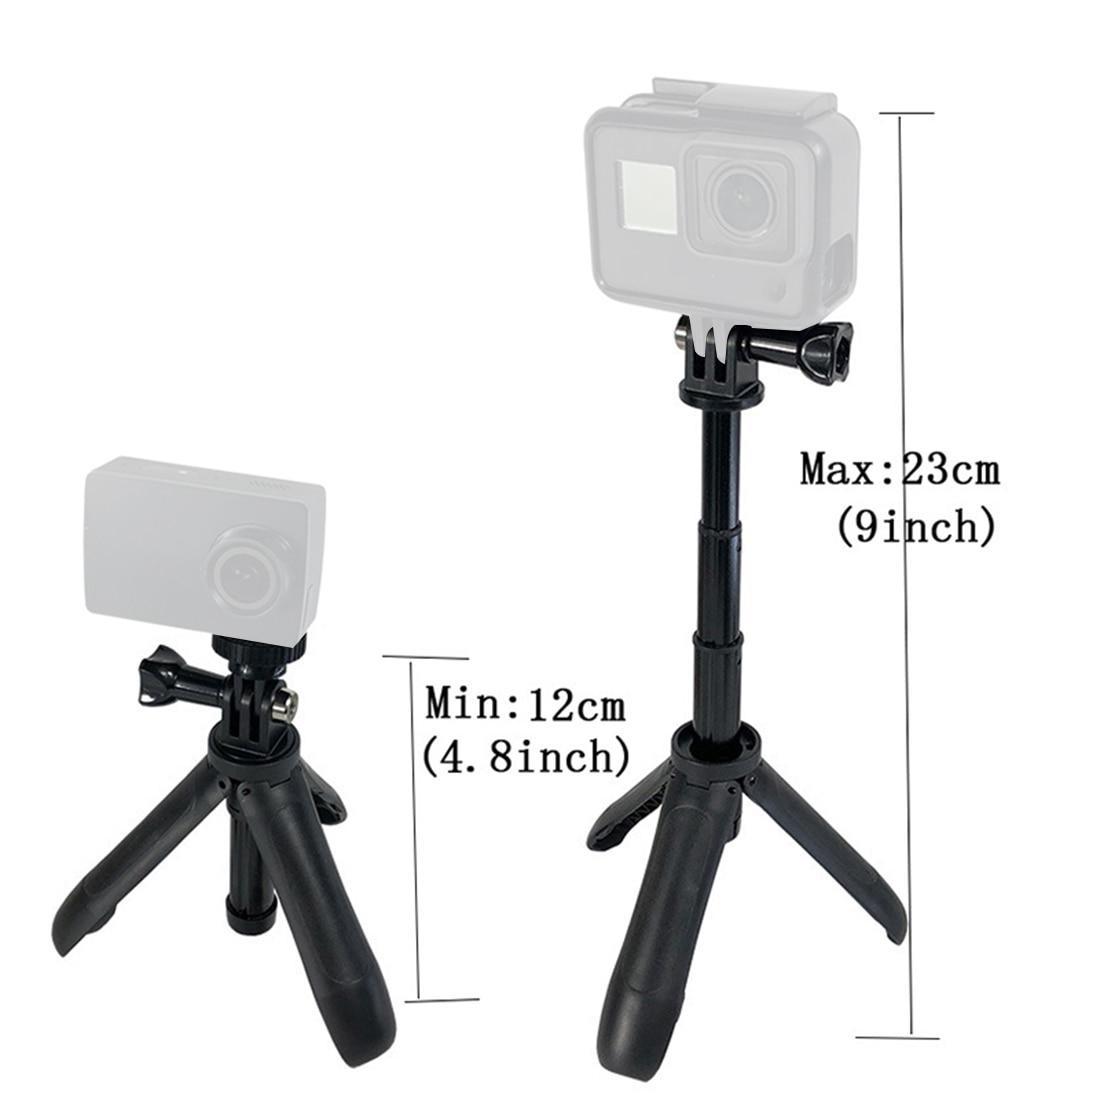 Mini Protable Tripod Extension Pole Handheld Monopod Pole Hand Grip Selfie Stick Mount for Gopro Hero 8 7 YI Osmo Action Camera-2